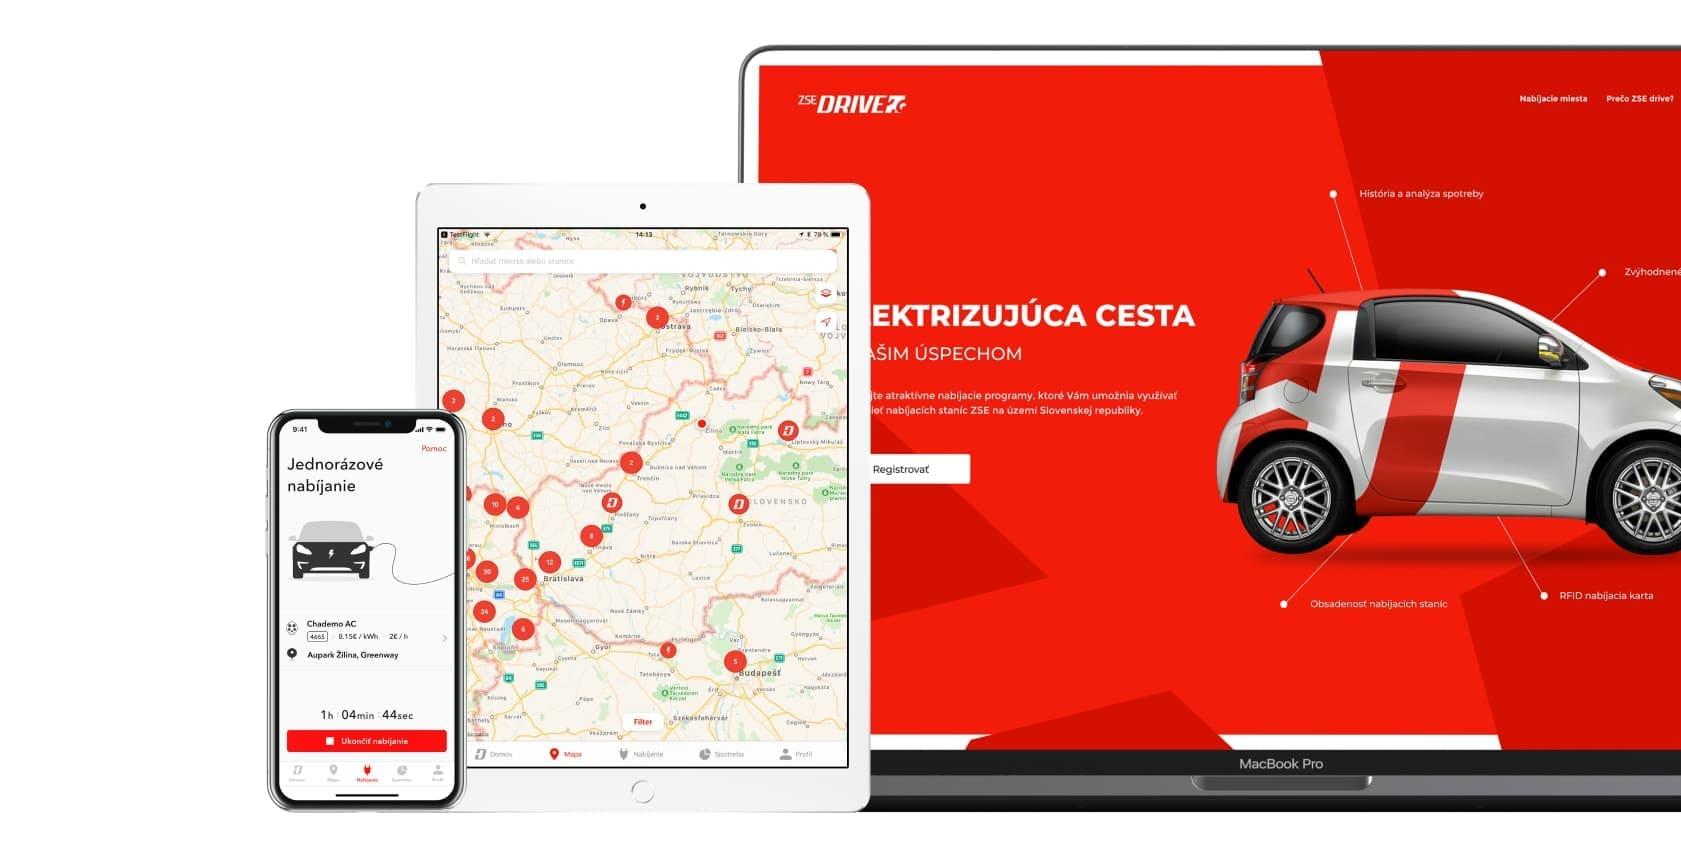 UX UI dizajn pre ios android web aplikacie zamerane na elektromobilitu